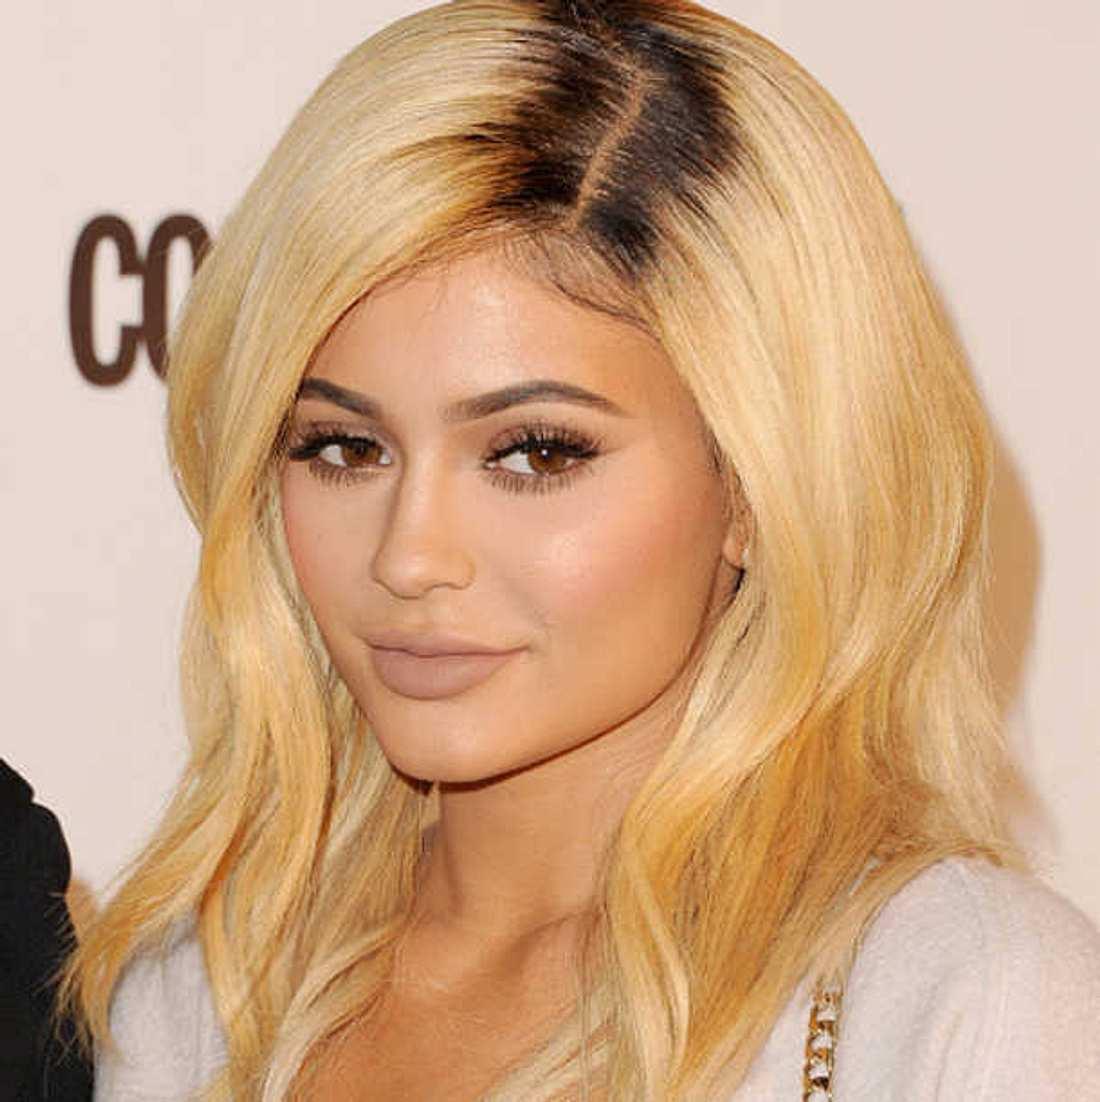 Kylie Jenner Haare blond